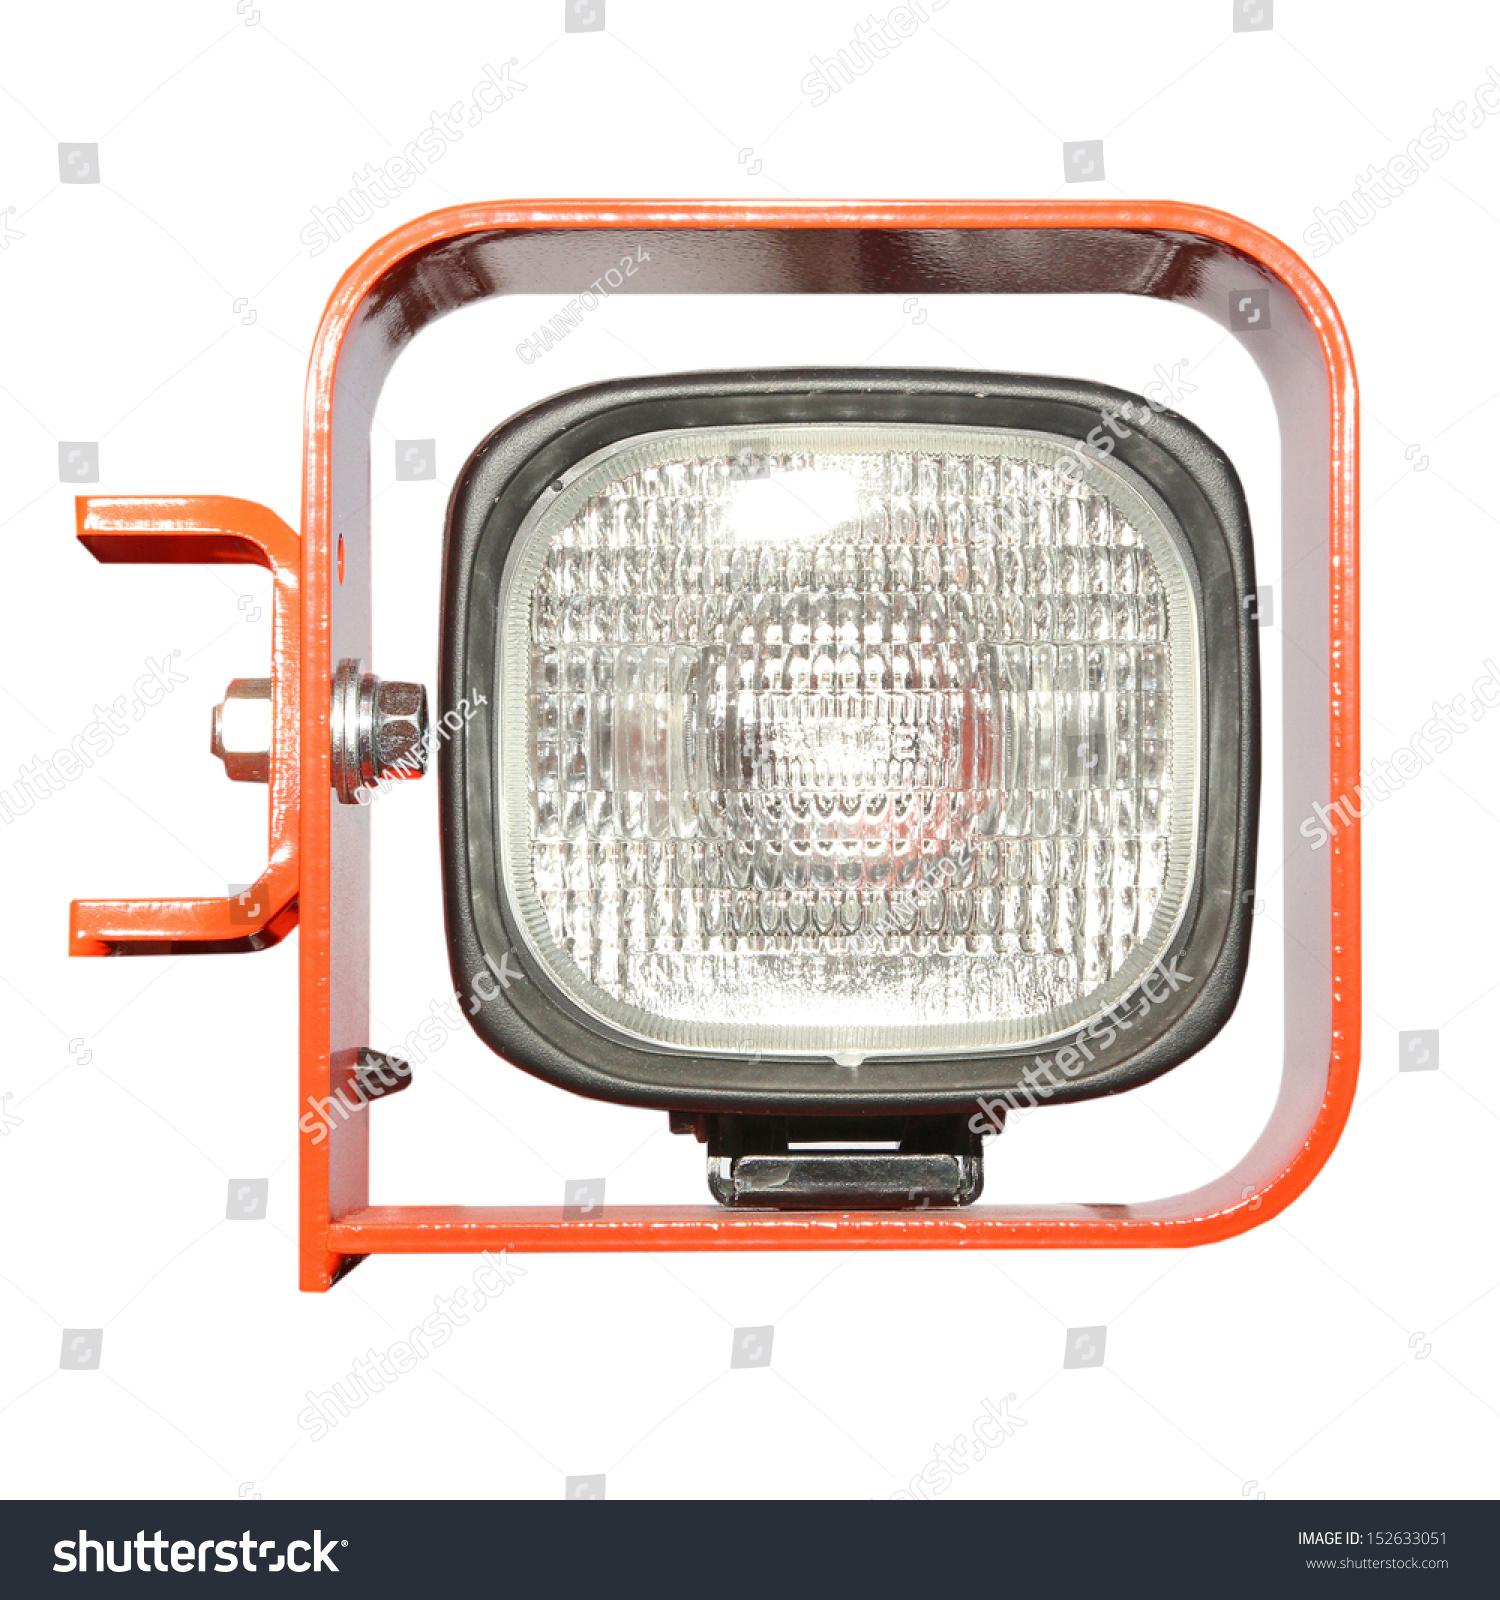 Dipped Beam Headlights : Automobile headlight dipped beam of excavator car stock